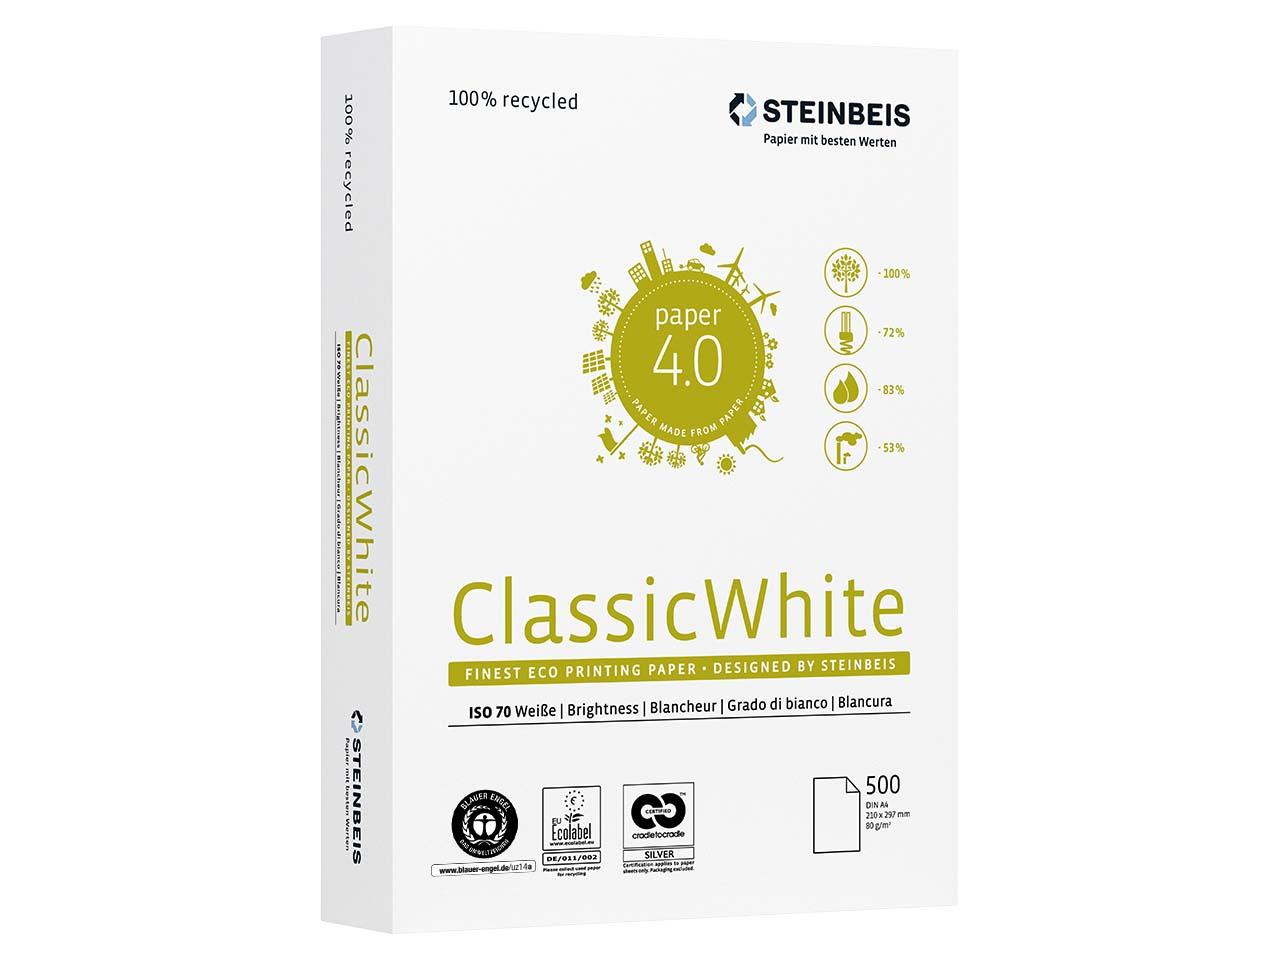 Бумага А4 80гр./м2. 500 лист. Classic White ISO 70/СІЕ 55 на 100% из втор. сырья, сероватый оттенок STEINBEIS - фото 3